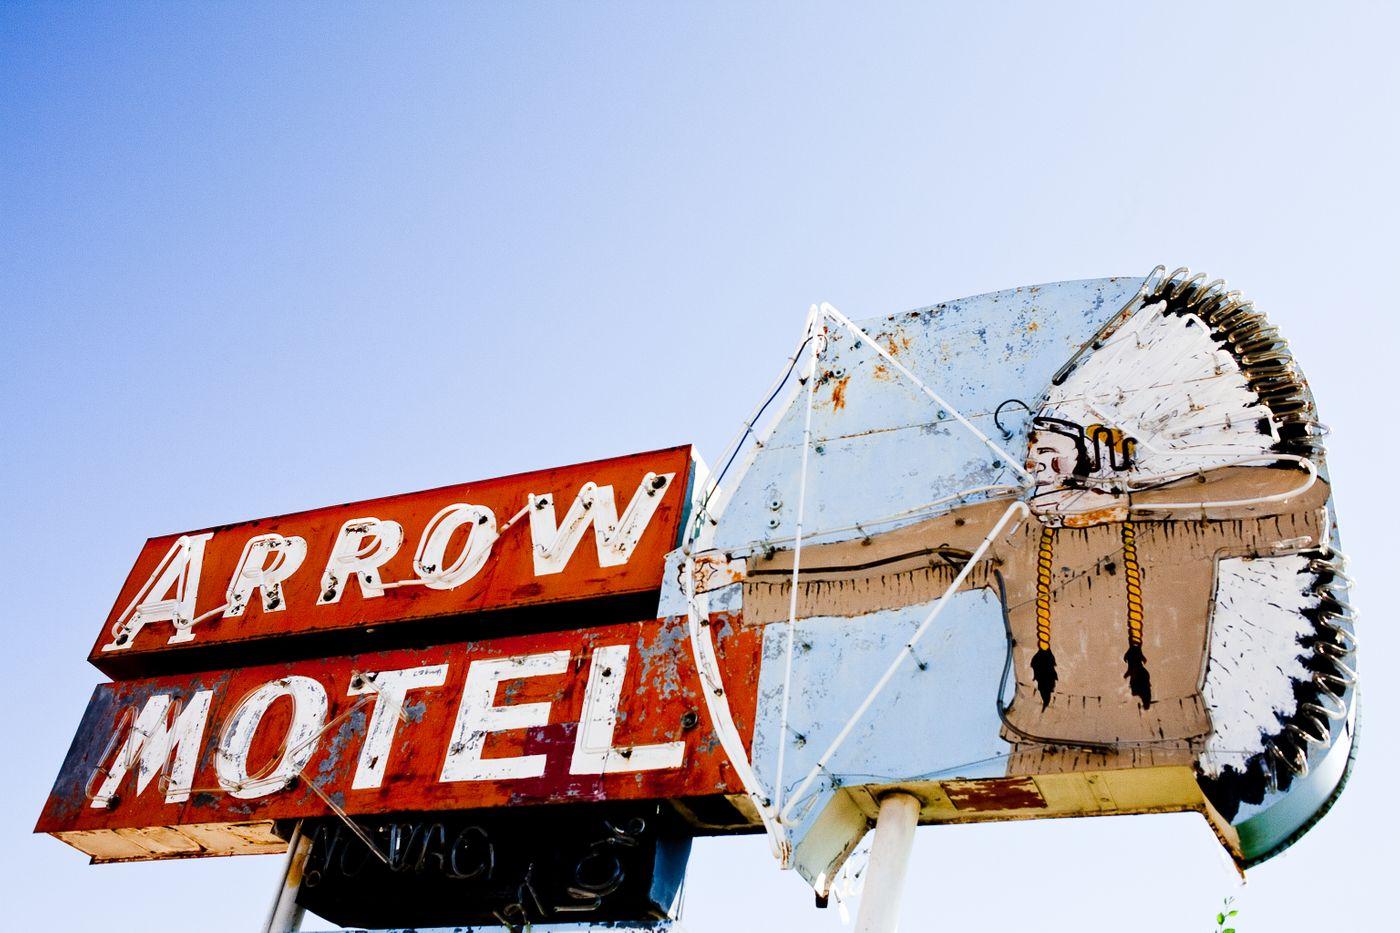 motel-web-2020-jpg-21-PRINT.jpg